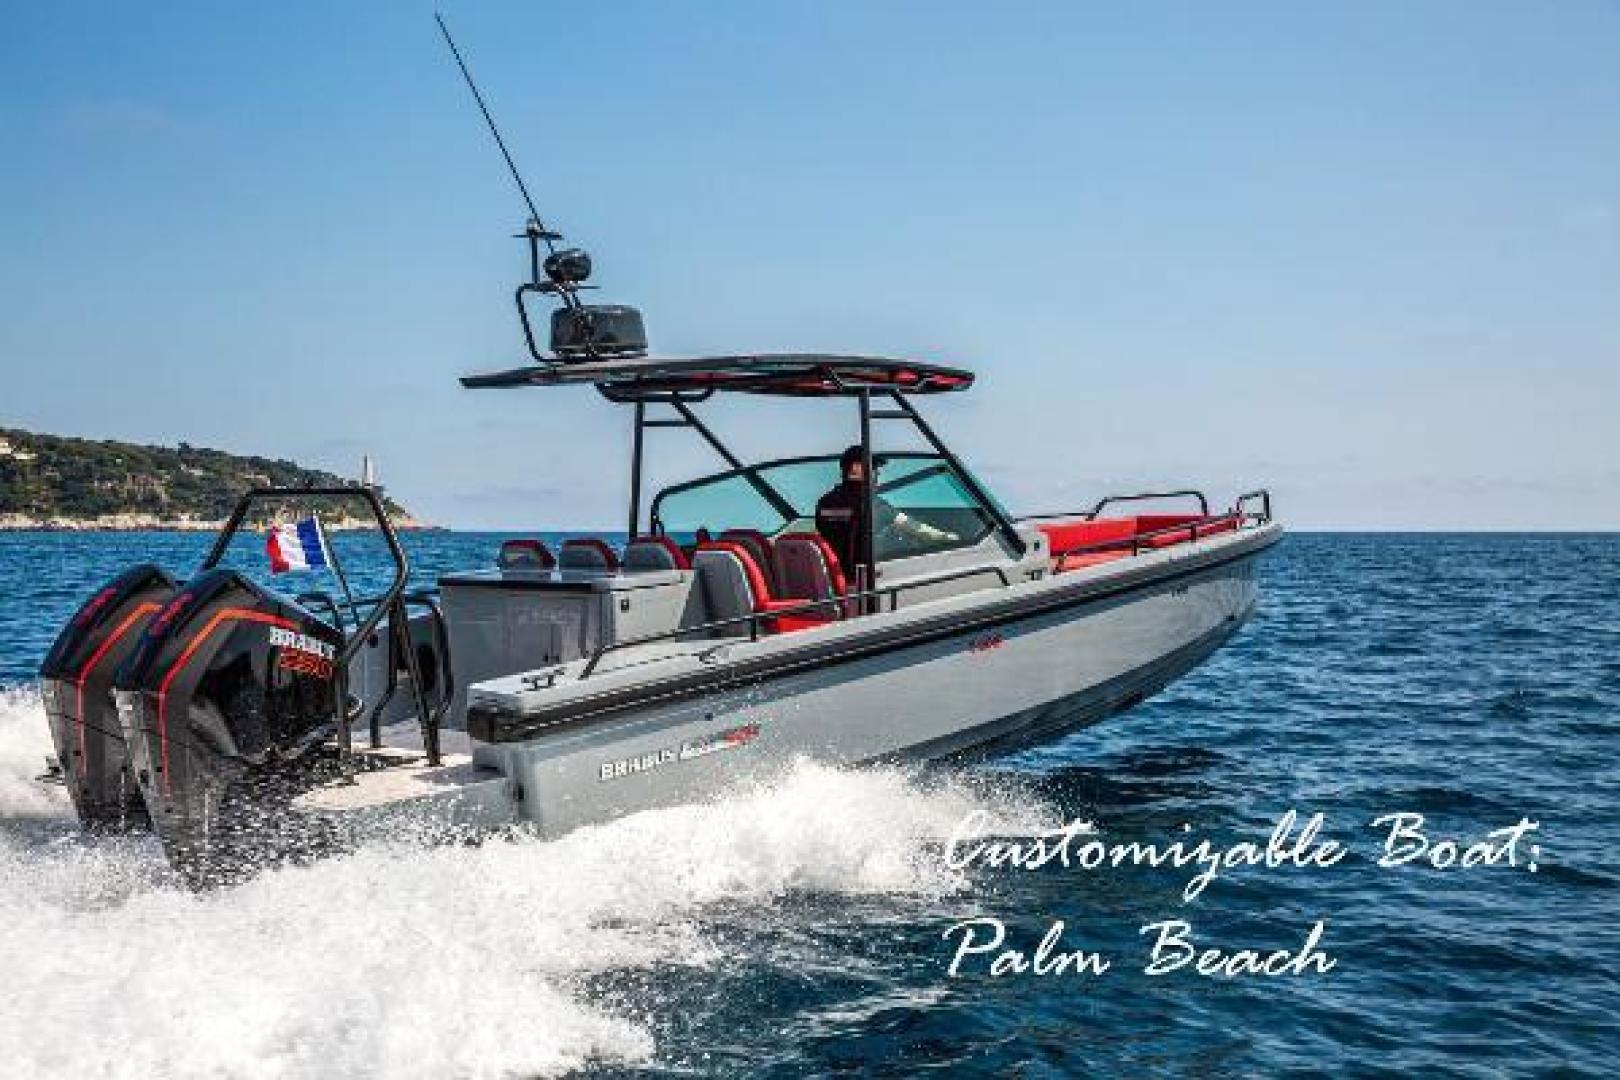 Shadow-Shadow 500 by Axopar 2021-Brabus Shadow 500 by Axopar Palm Beach-Florida-United States-1528311 | Thumbnail